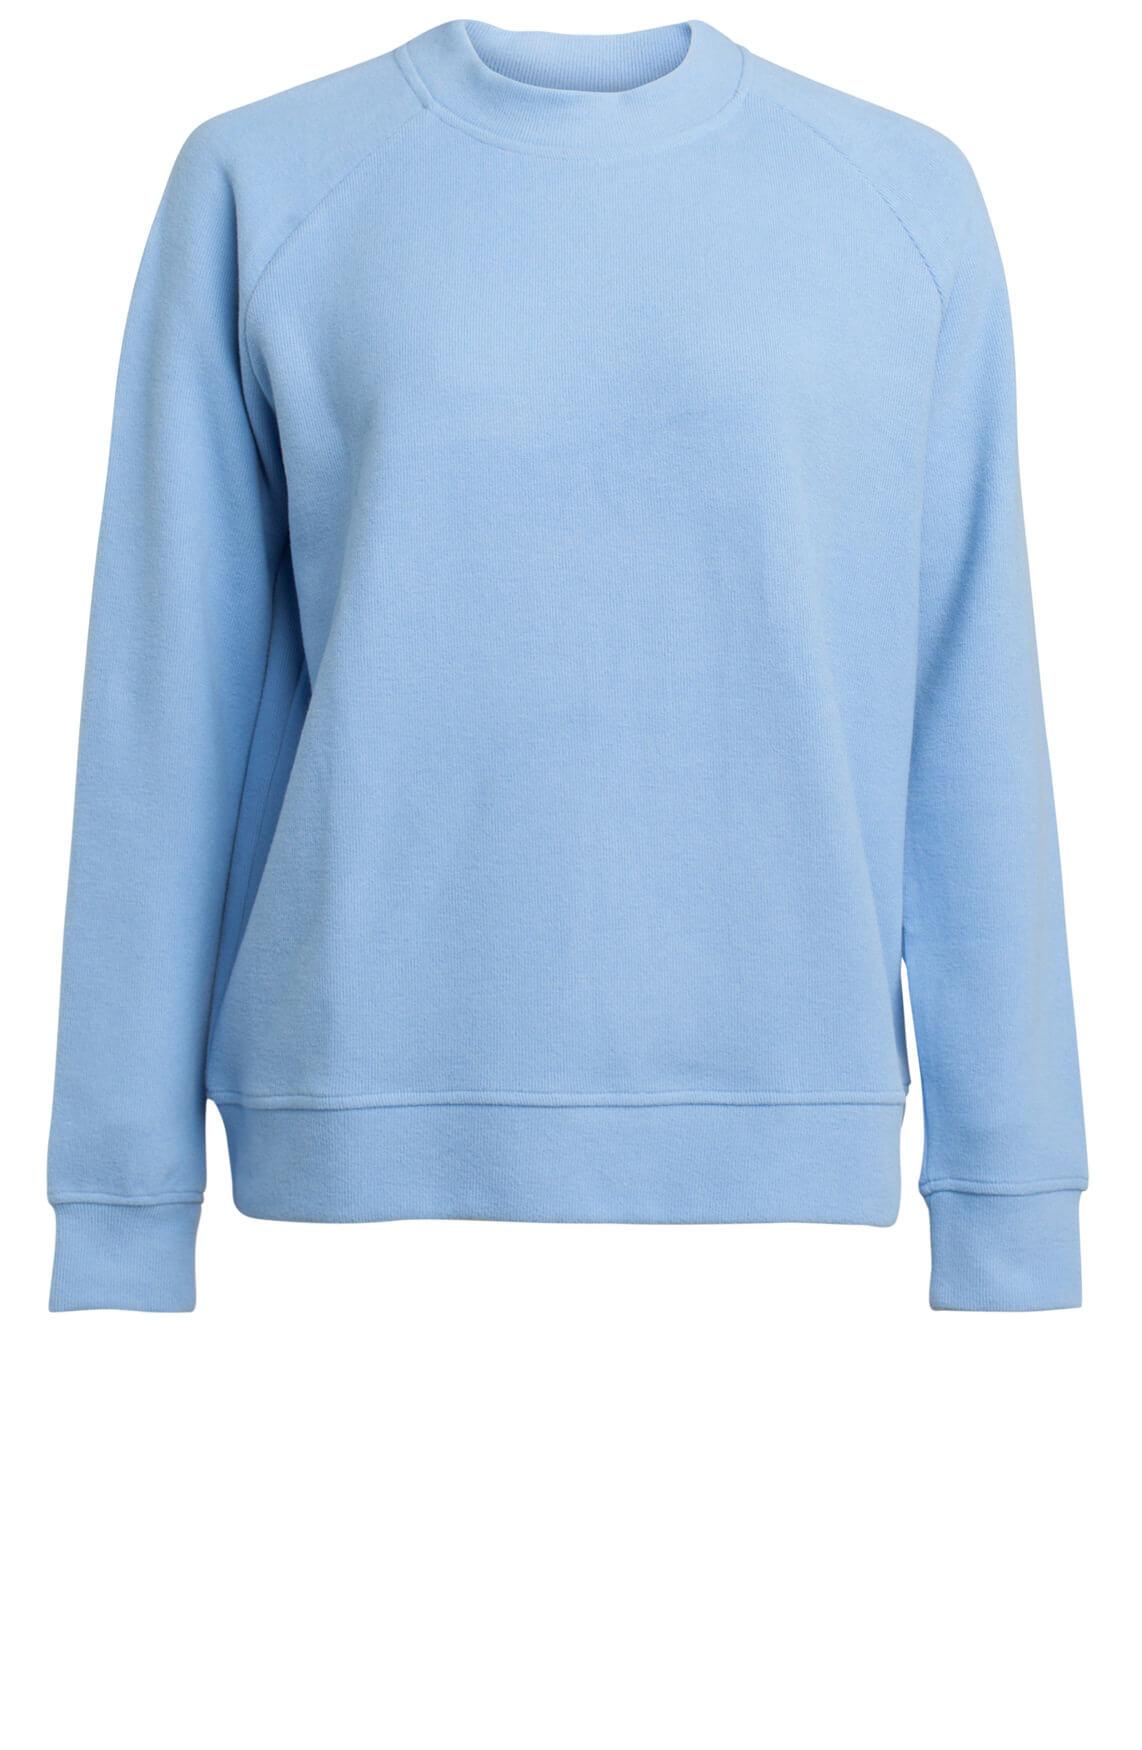 Samsoe Samsoe Dames Apo O-neck sweater Blauw